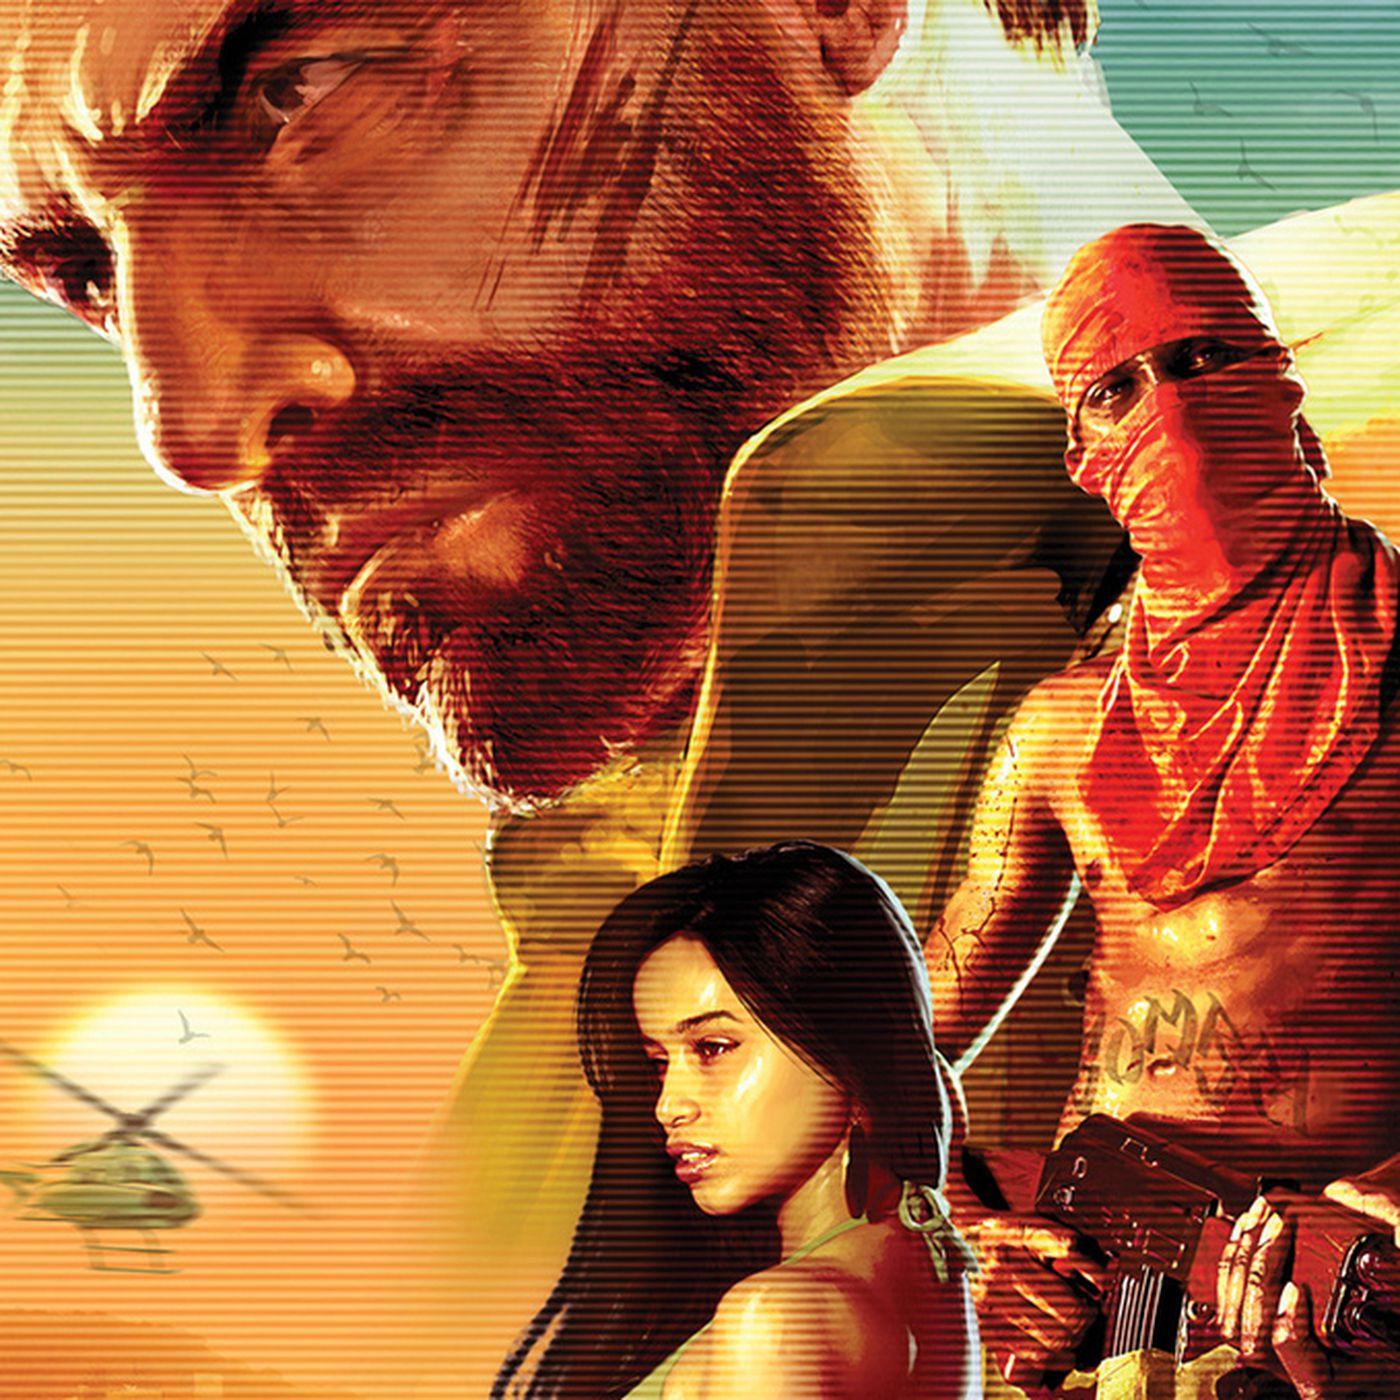 Unlock Halloween Skull Masks In Max Payne 3 This Friday Polygon